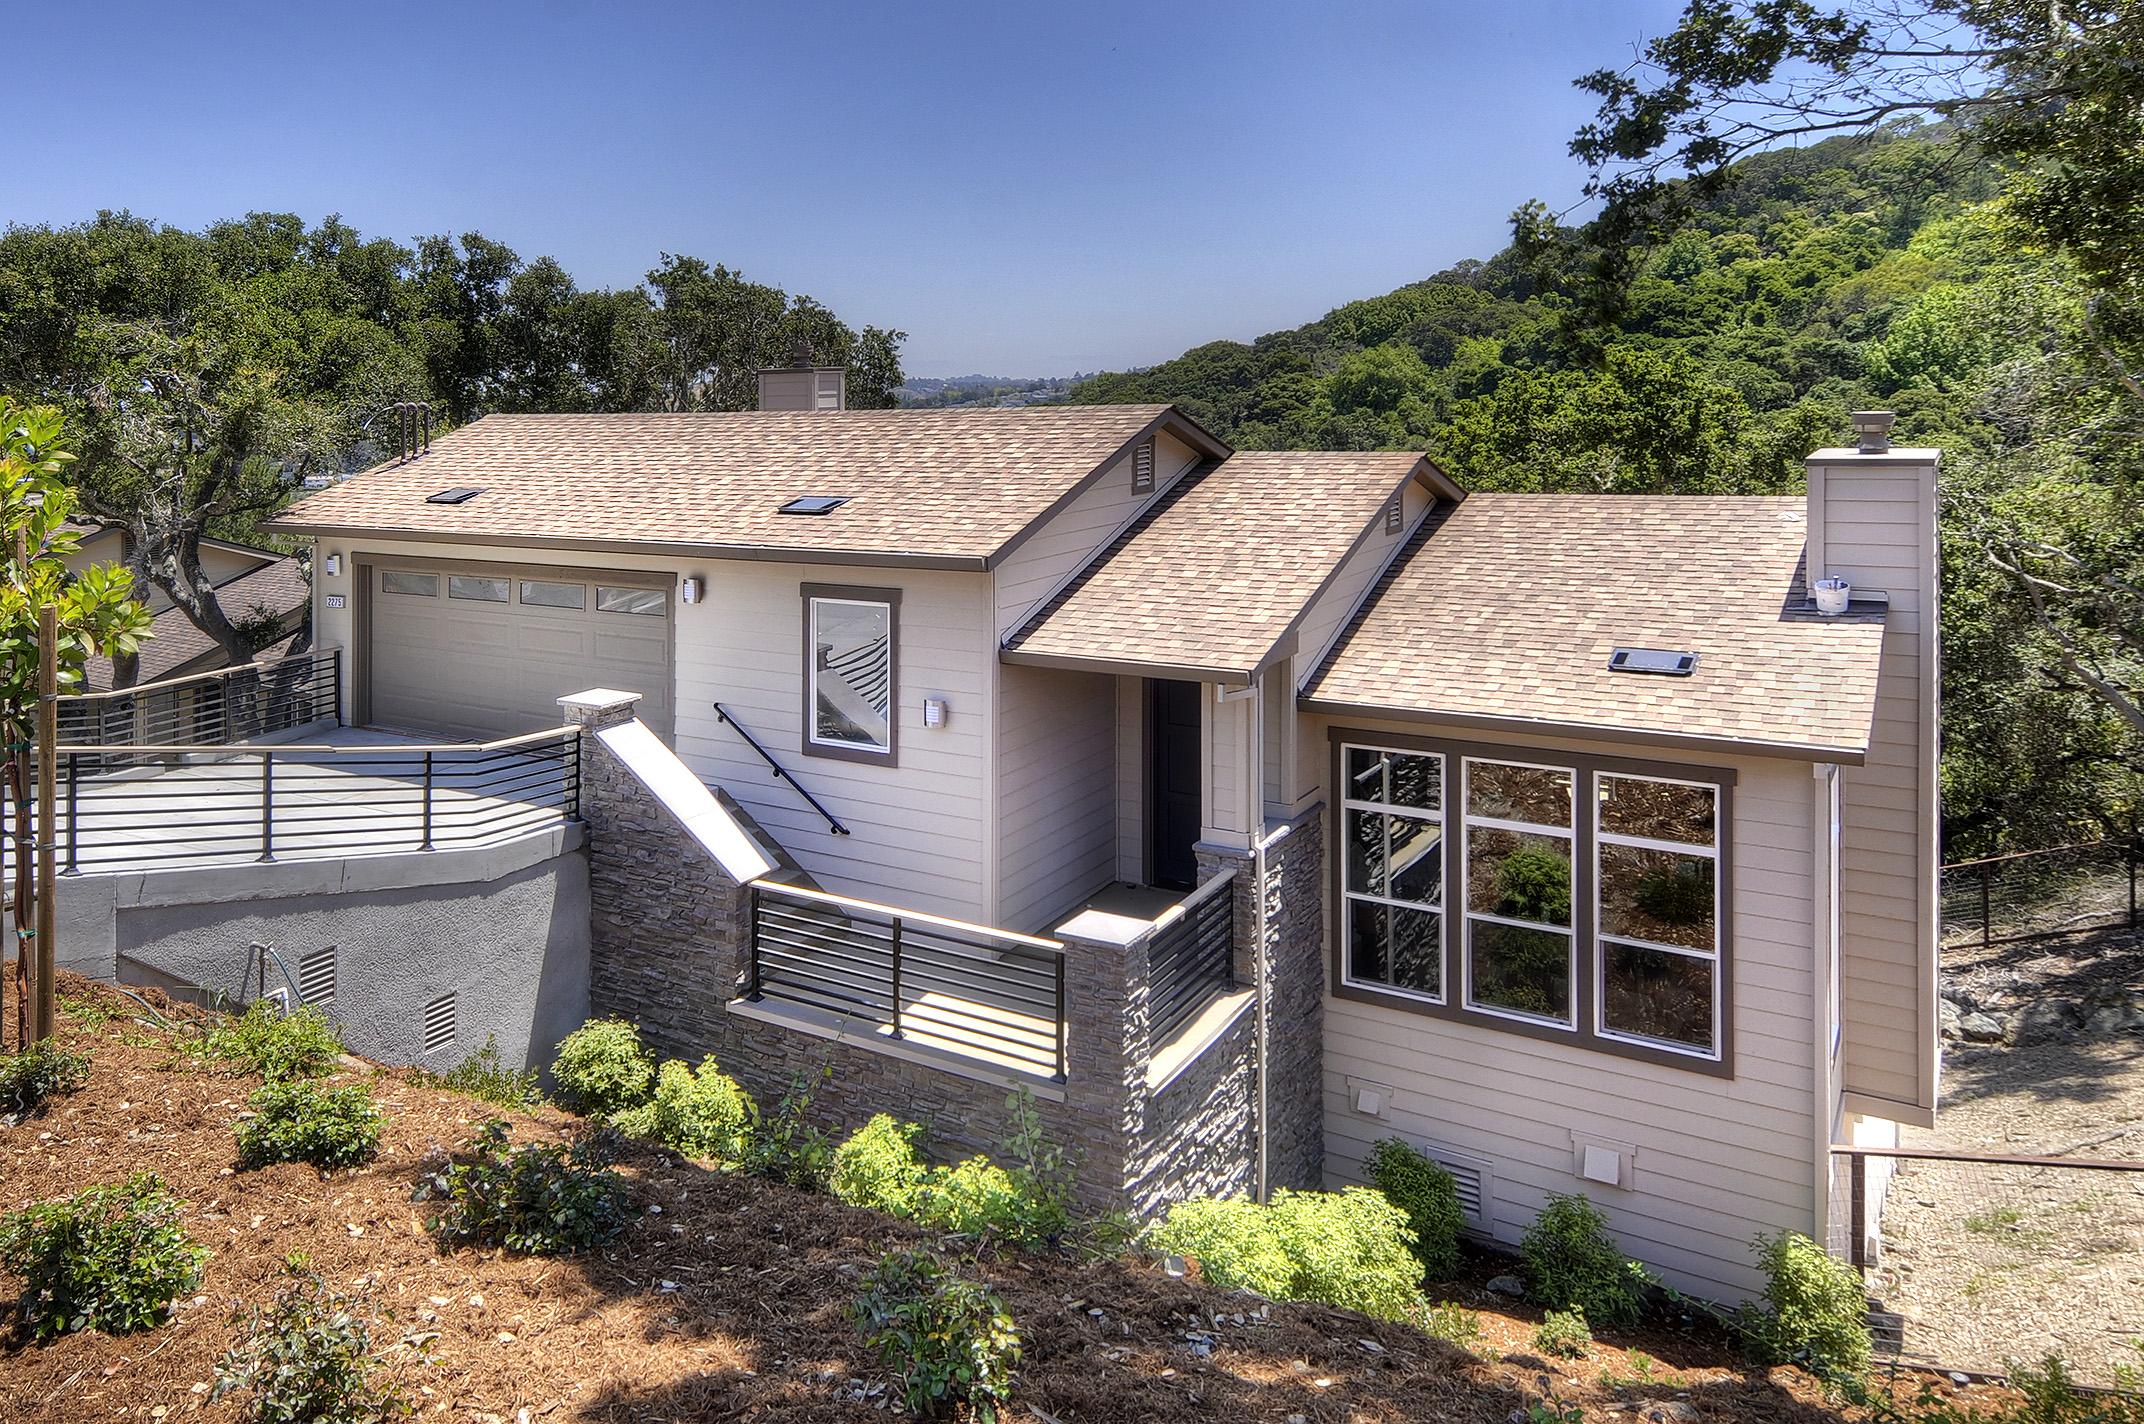 2275 Bunker Hill Dr, San Mateo, CA 94402